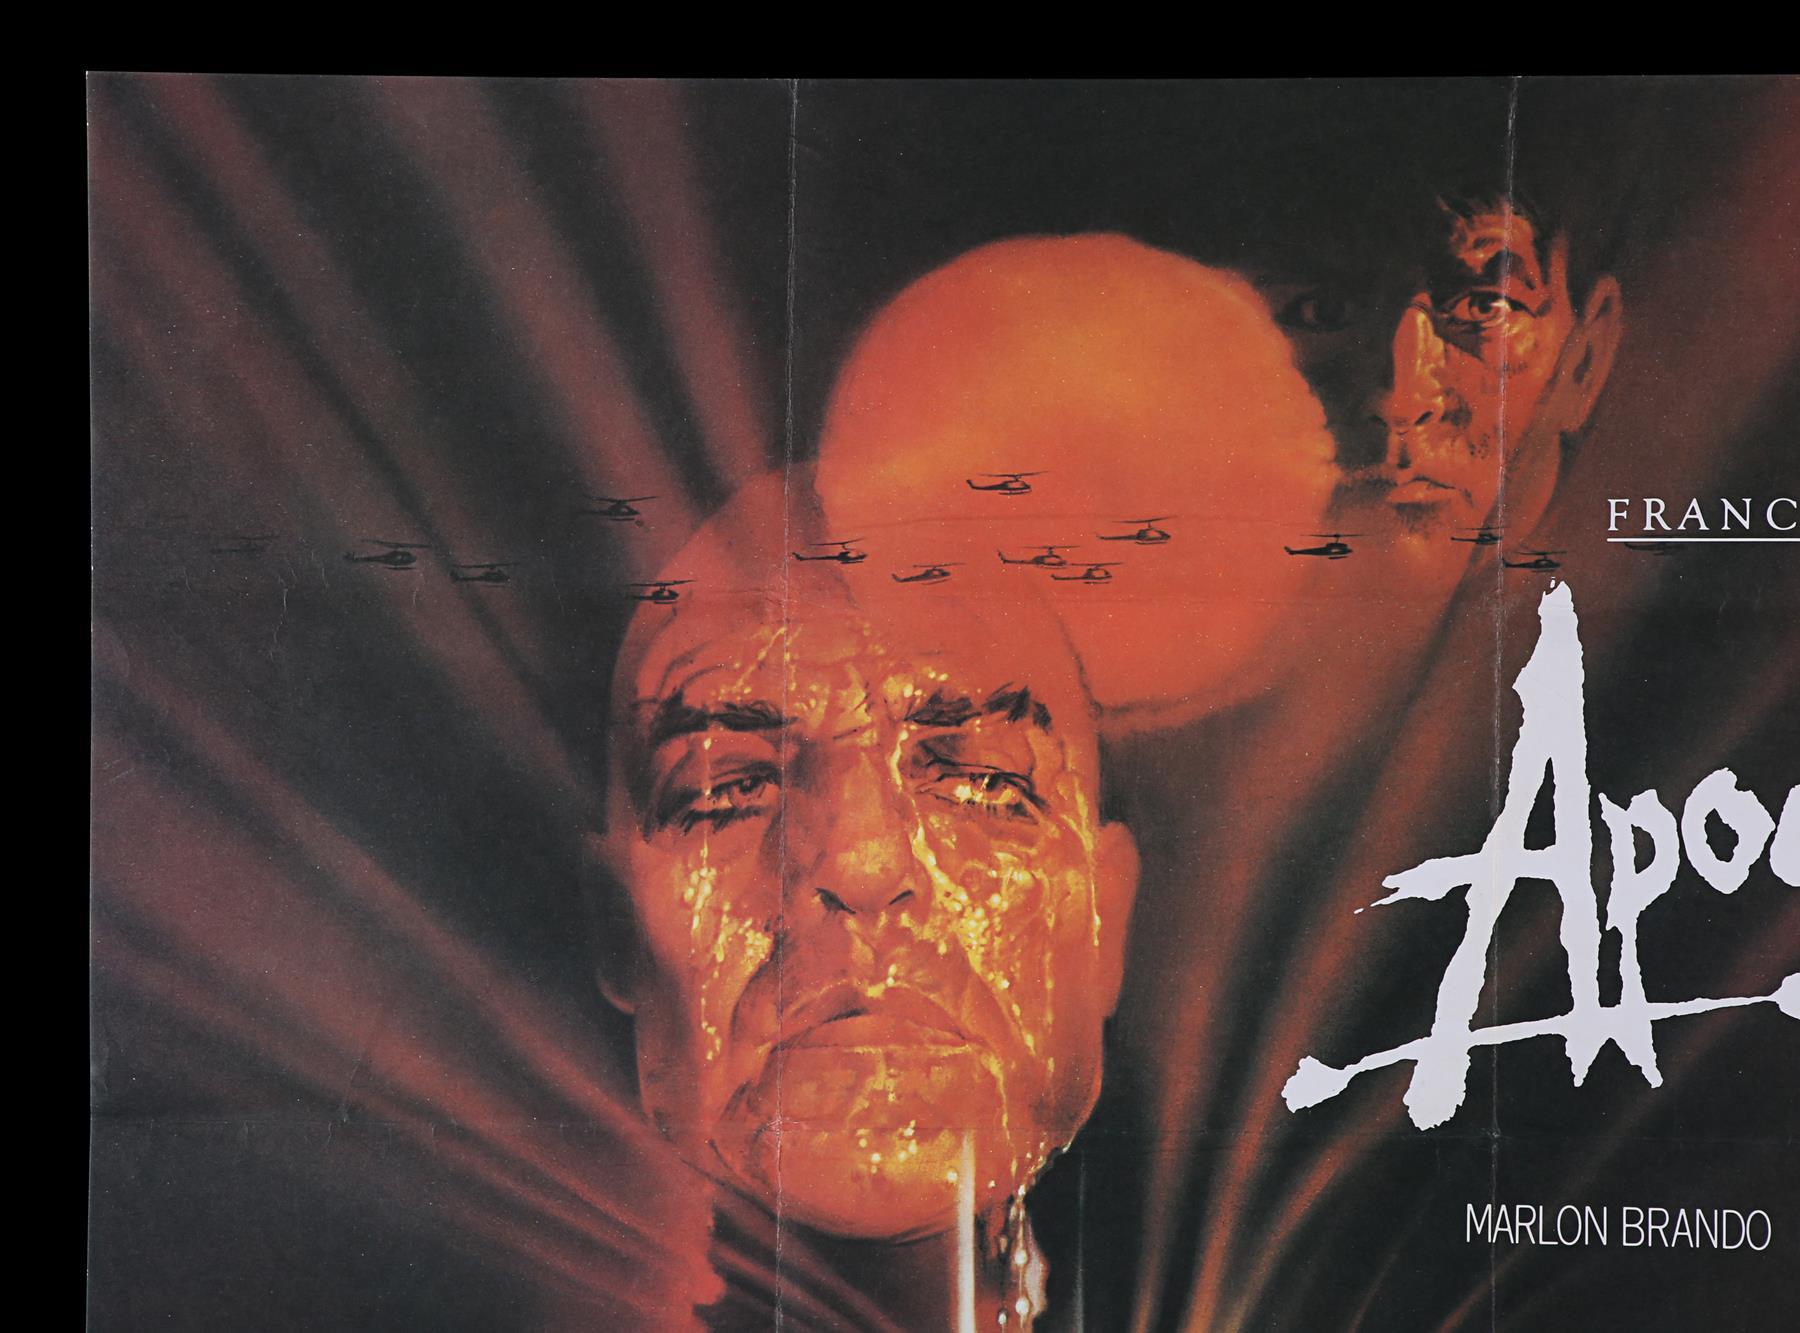 APOCALYPSE NOW (1979) - UK Quad, 1979 - Image 2 of 7